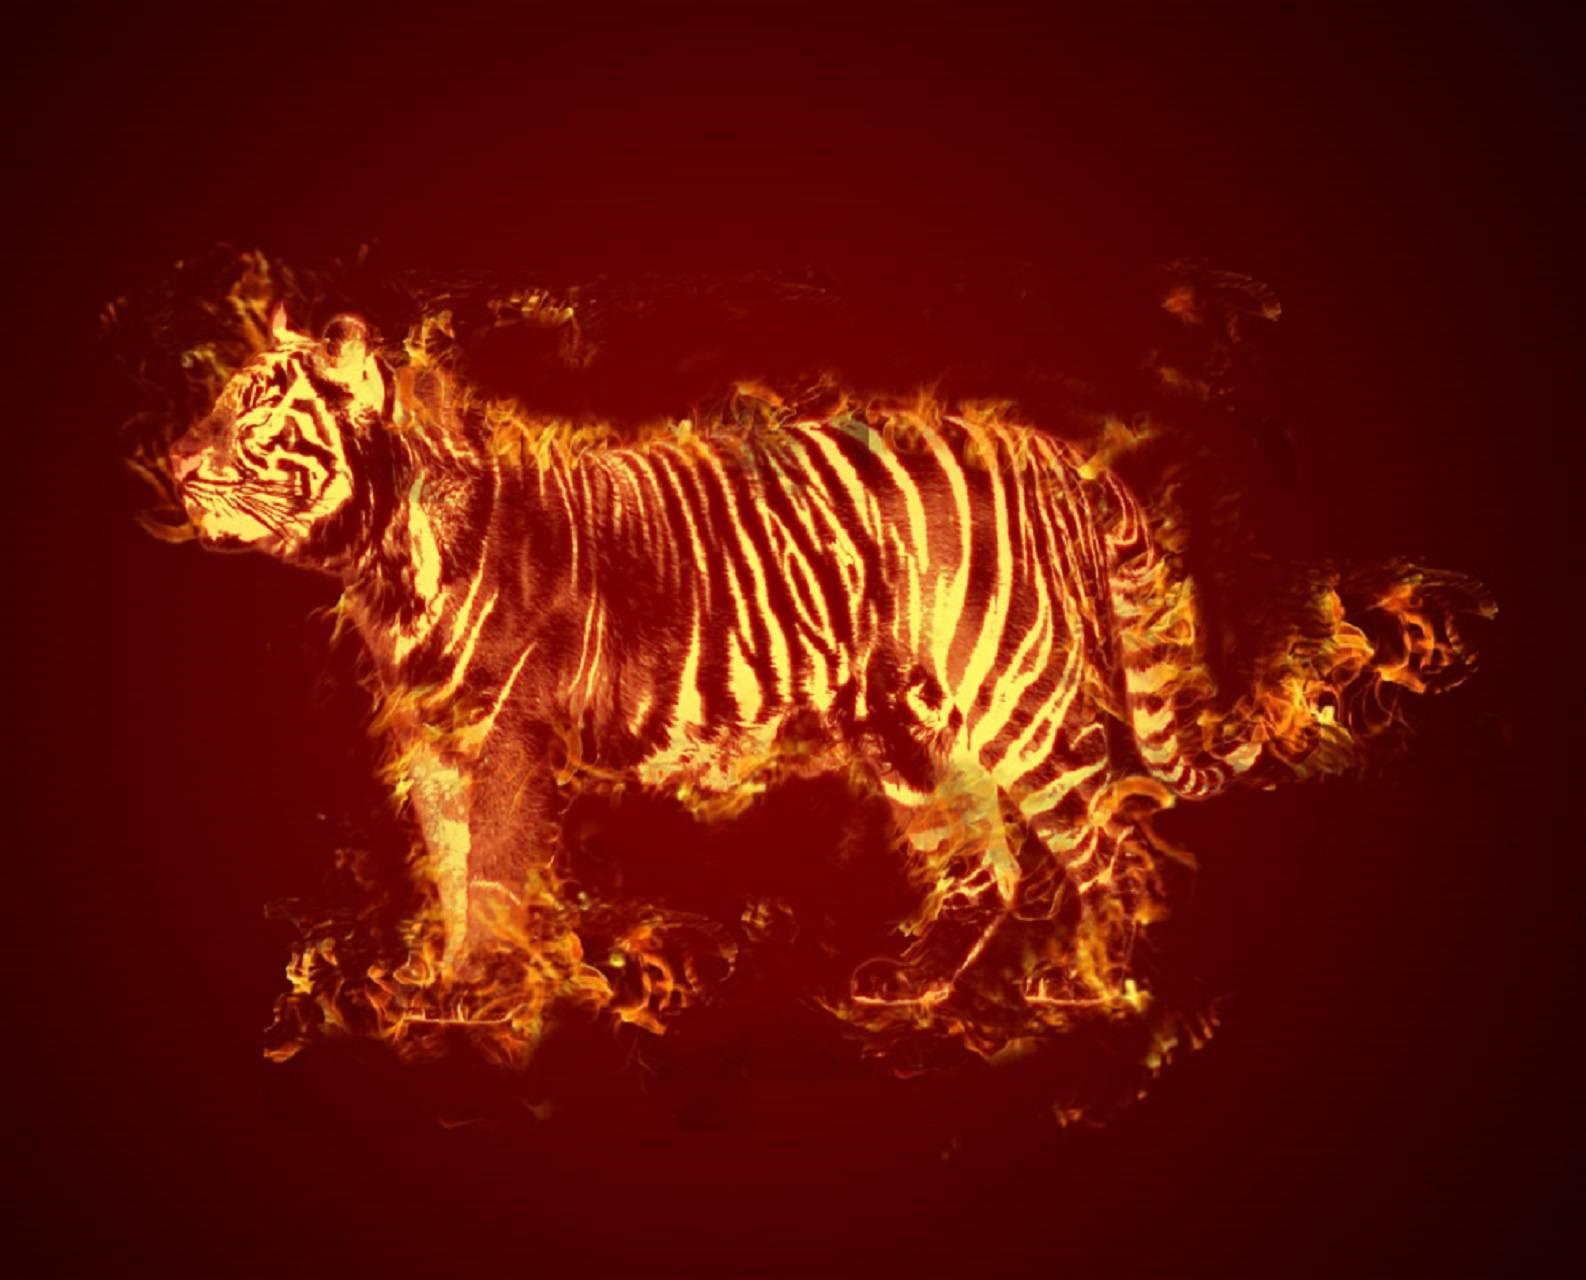 Картинки с огненными тиграми